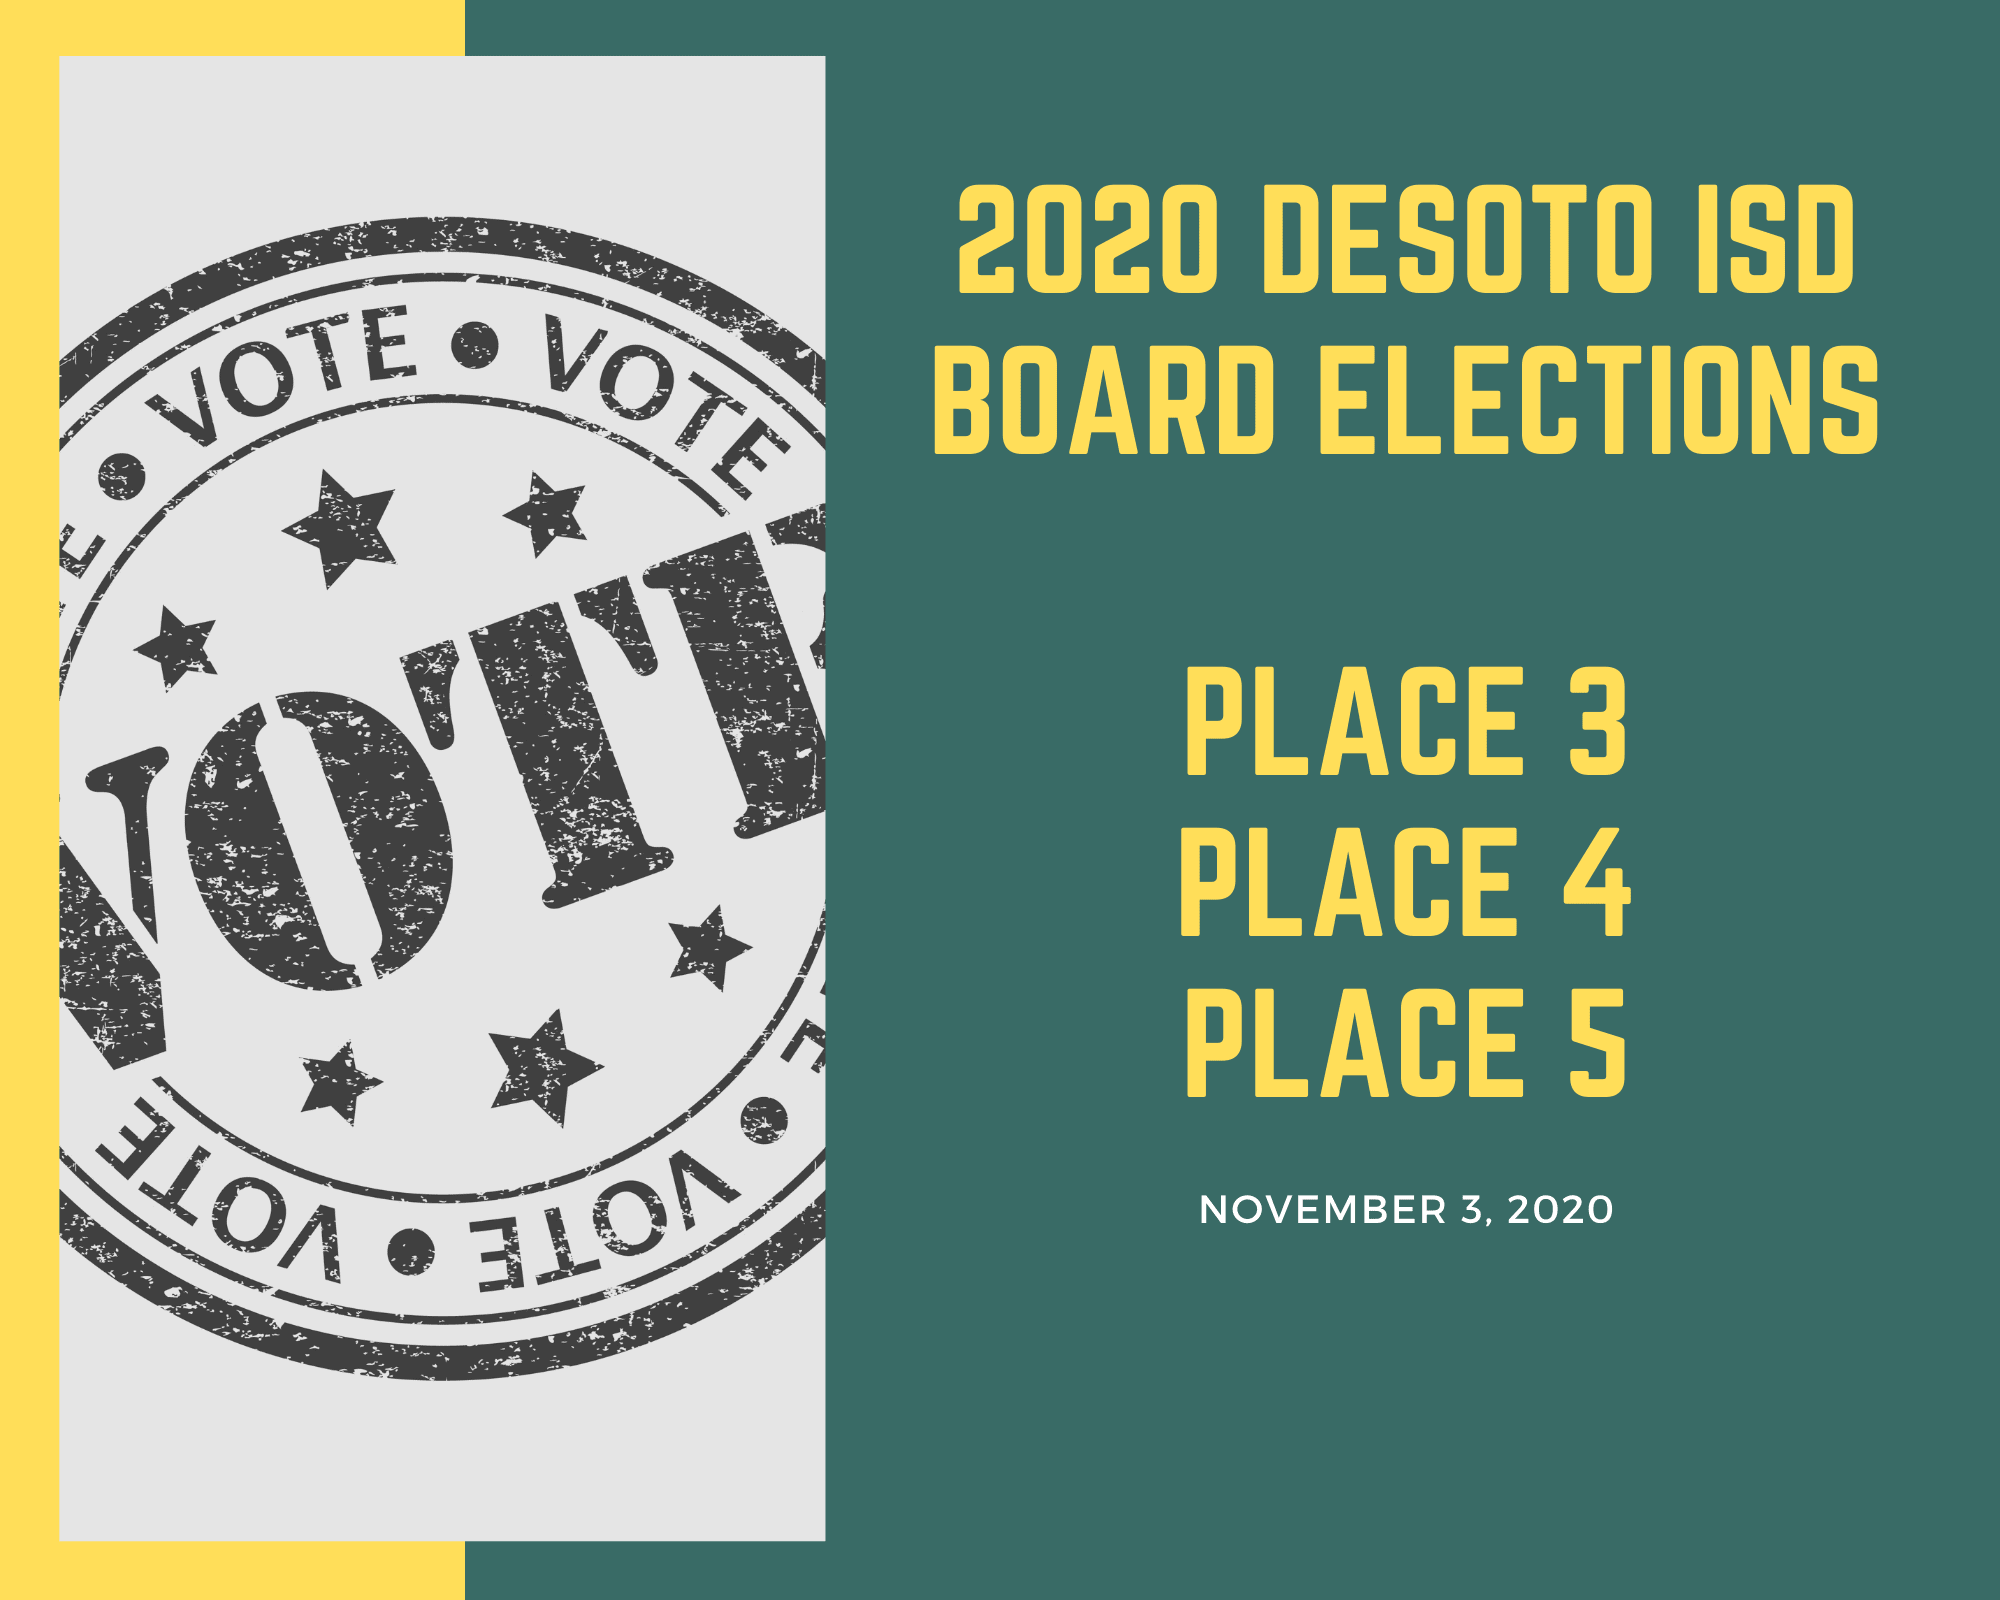 DeSoto ISD Elections graphic